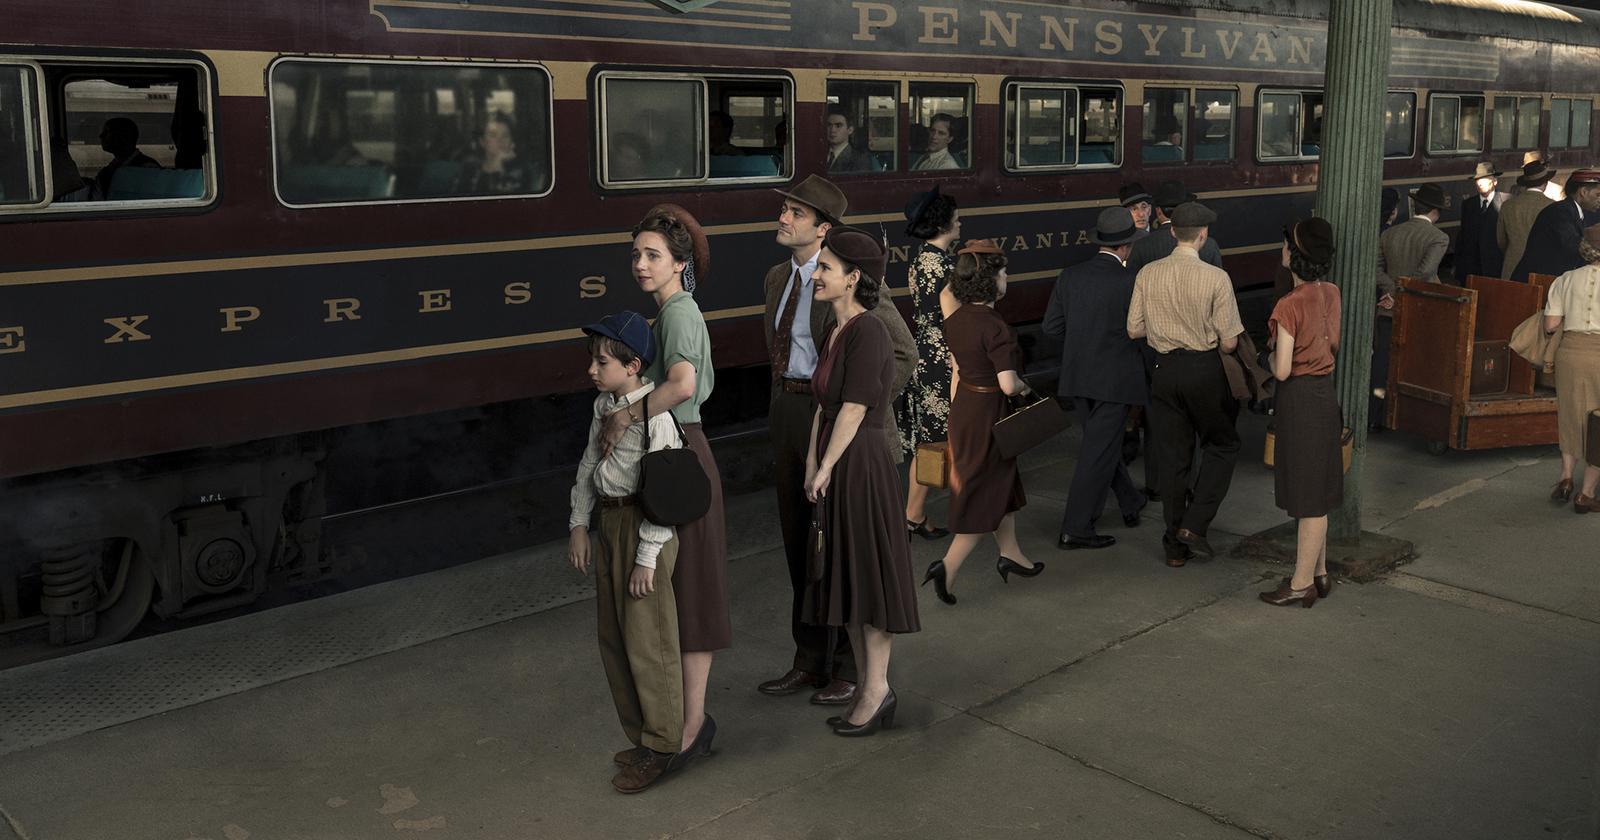 Escena de The plot against America. Una familia judía antigua espera para abordar un tren que dice Pennsylvania.